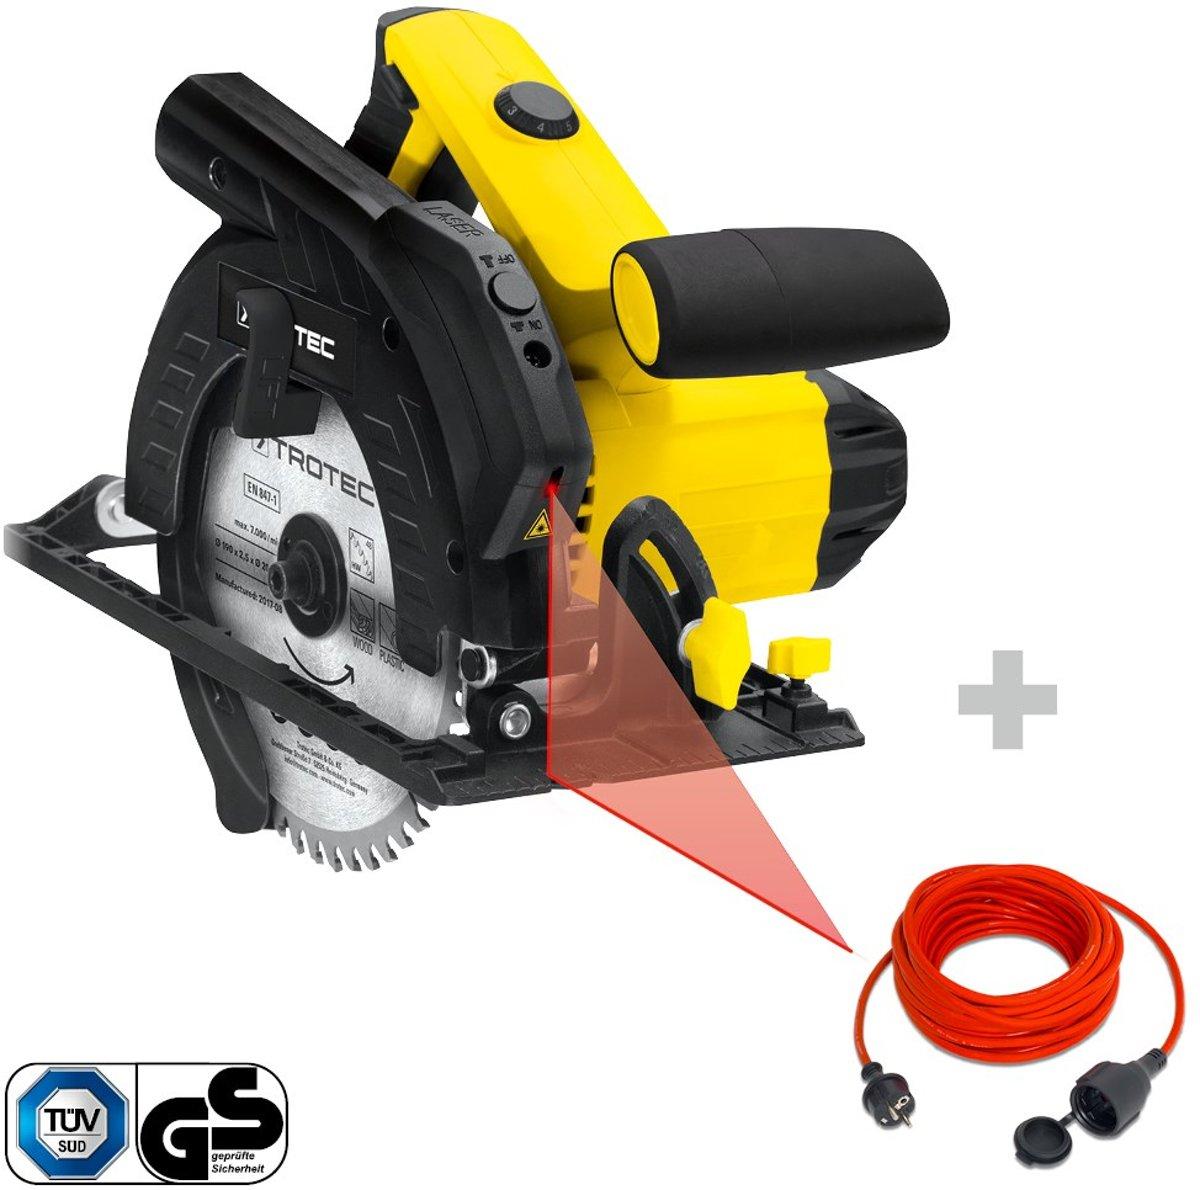 Trotec handcirkelzaag PCSS 10-1400 & kwaliteits verlengsnoer 15 m / 230 V / 1,5 mm²